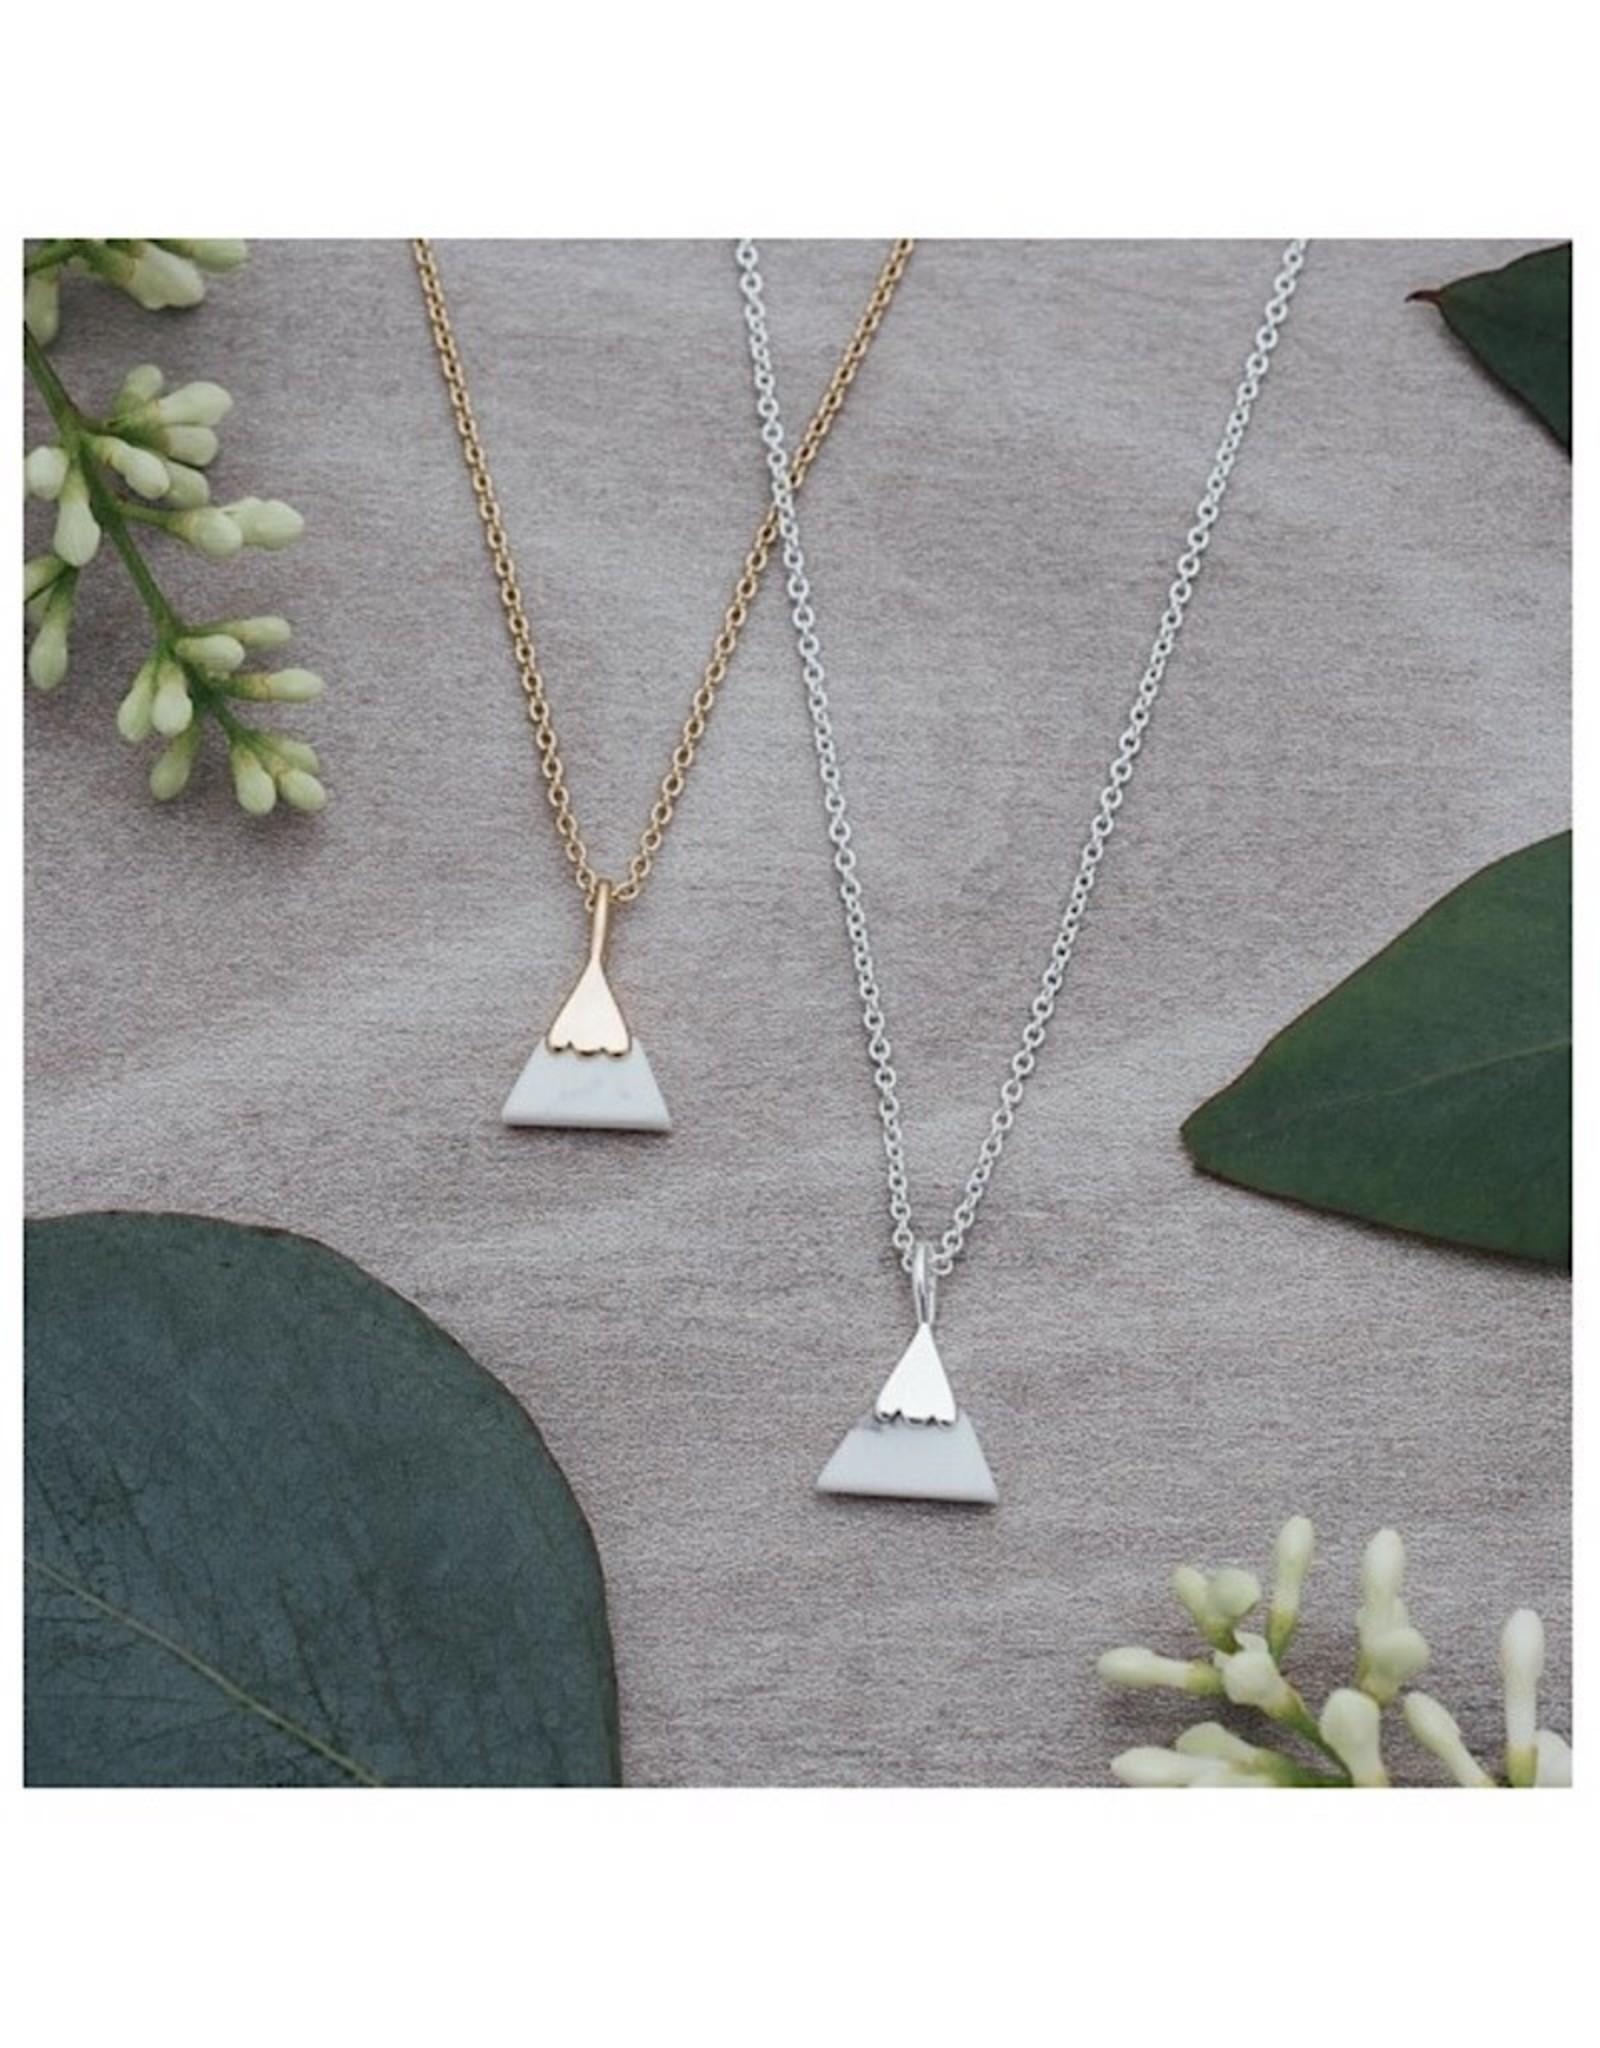 Glee Peak Necklace